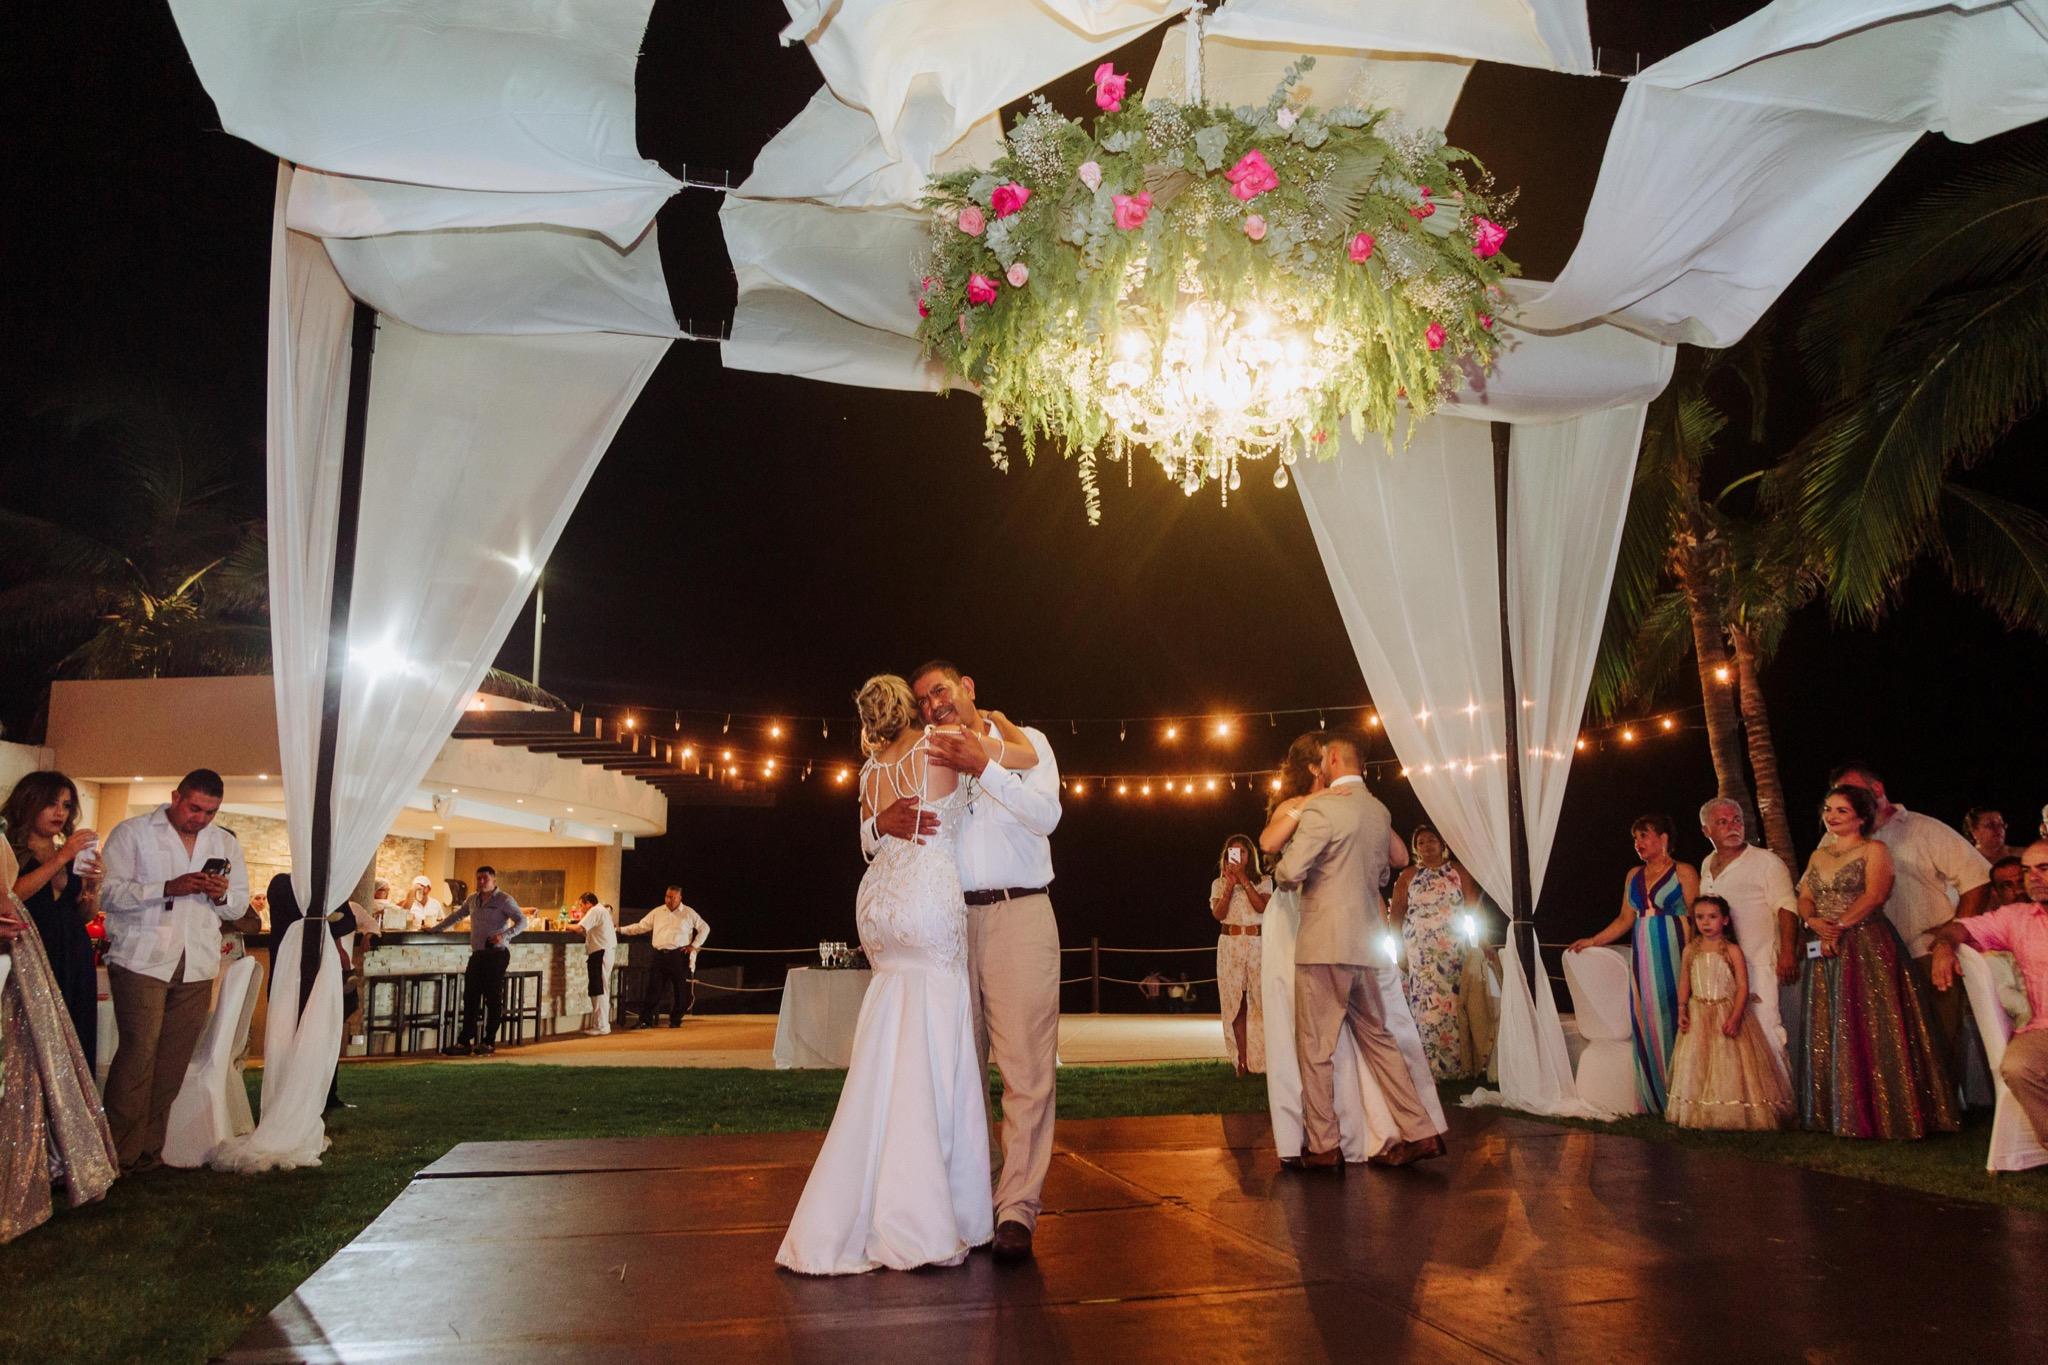 Javier_noriega_fotografo_bodas_profesional_zacatecas_mexico_mazatlan_sinaloa_photographer_weddings72